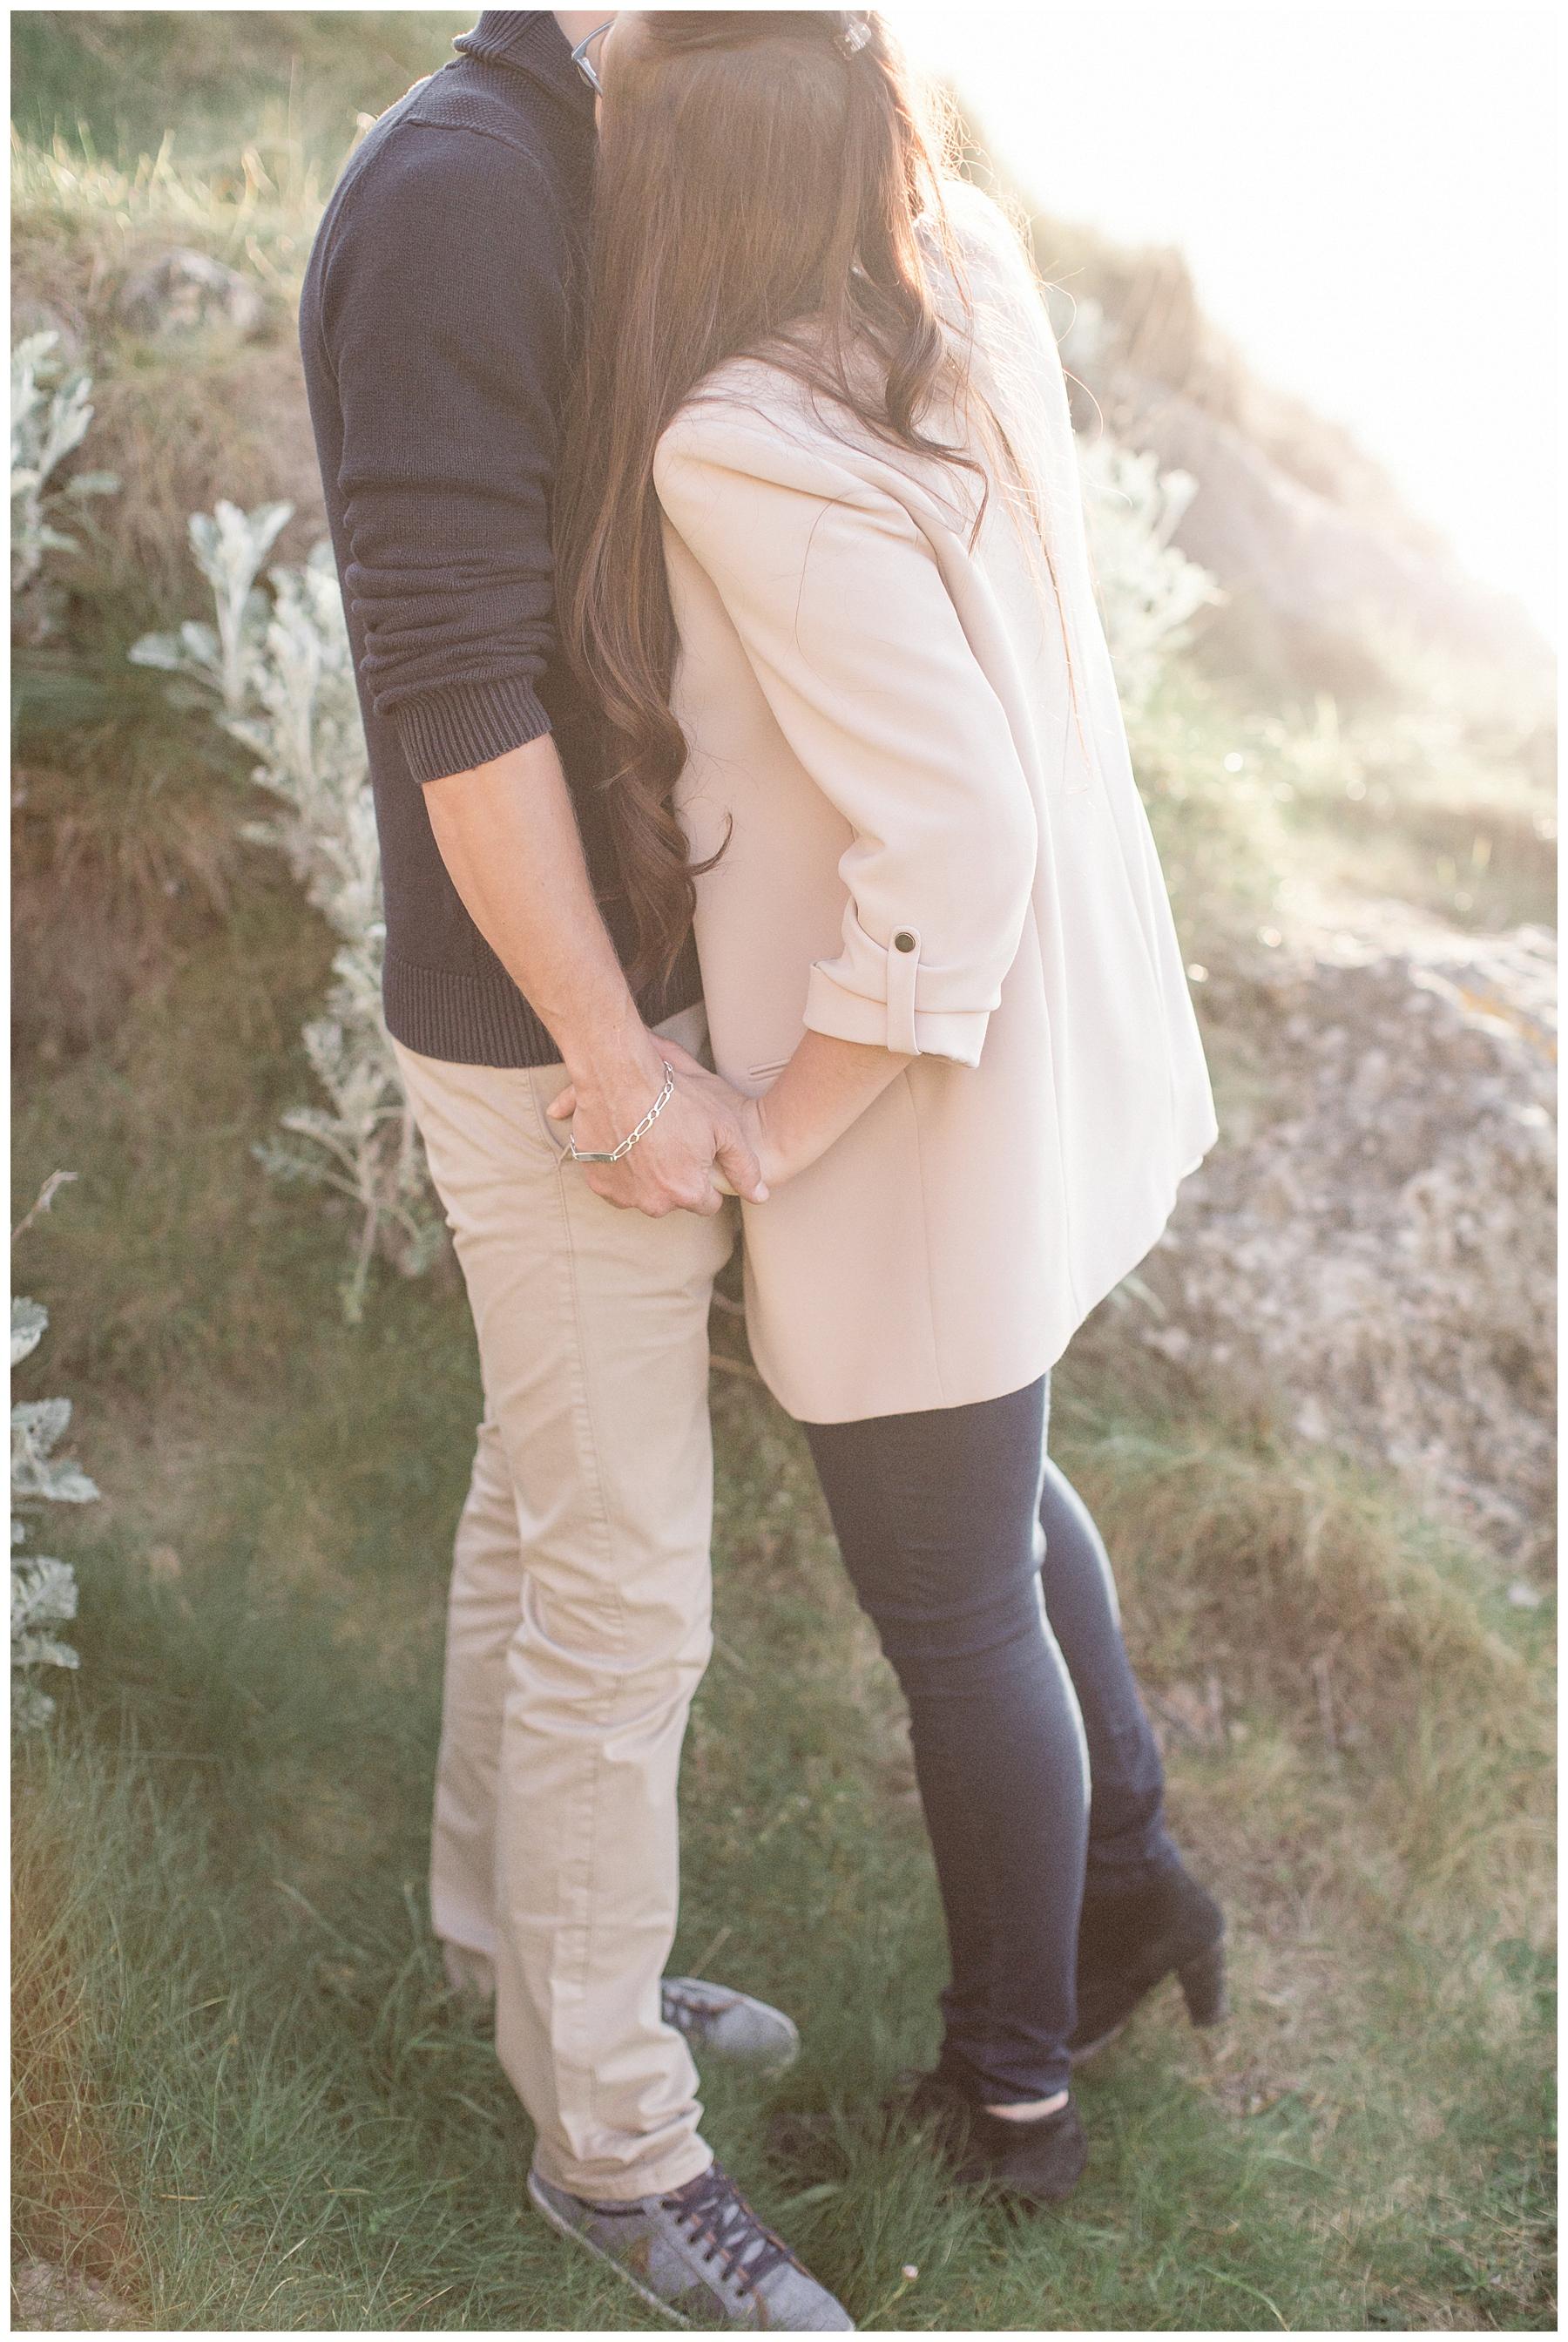 Marie-Alice G-Photographe couple fiancailles valognes cherbourg manche normandie - photographe mariage france_0024